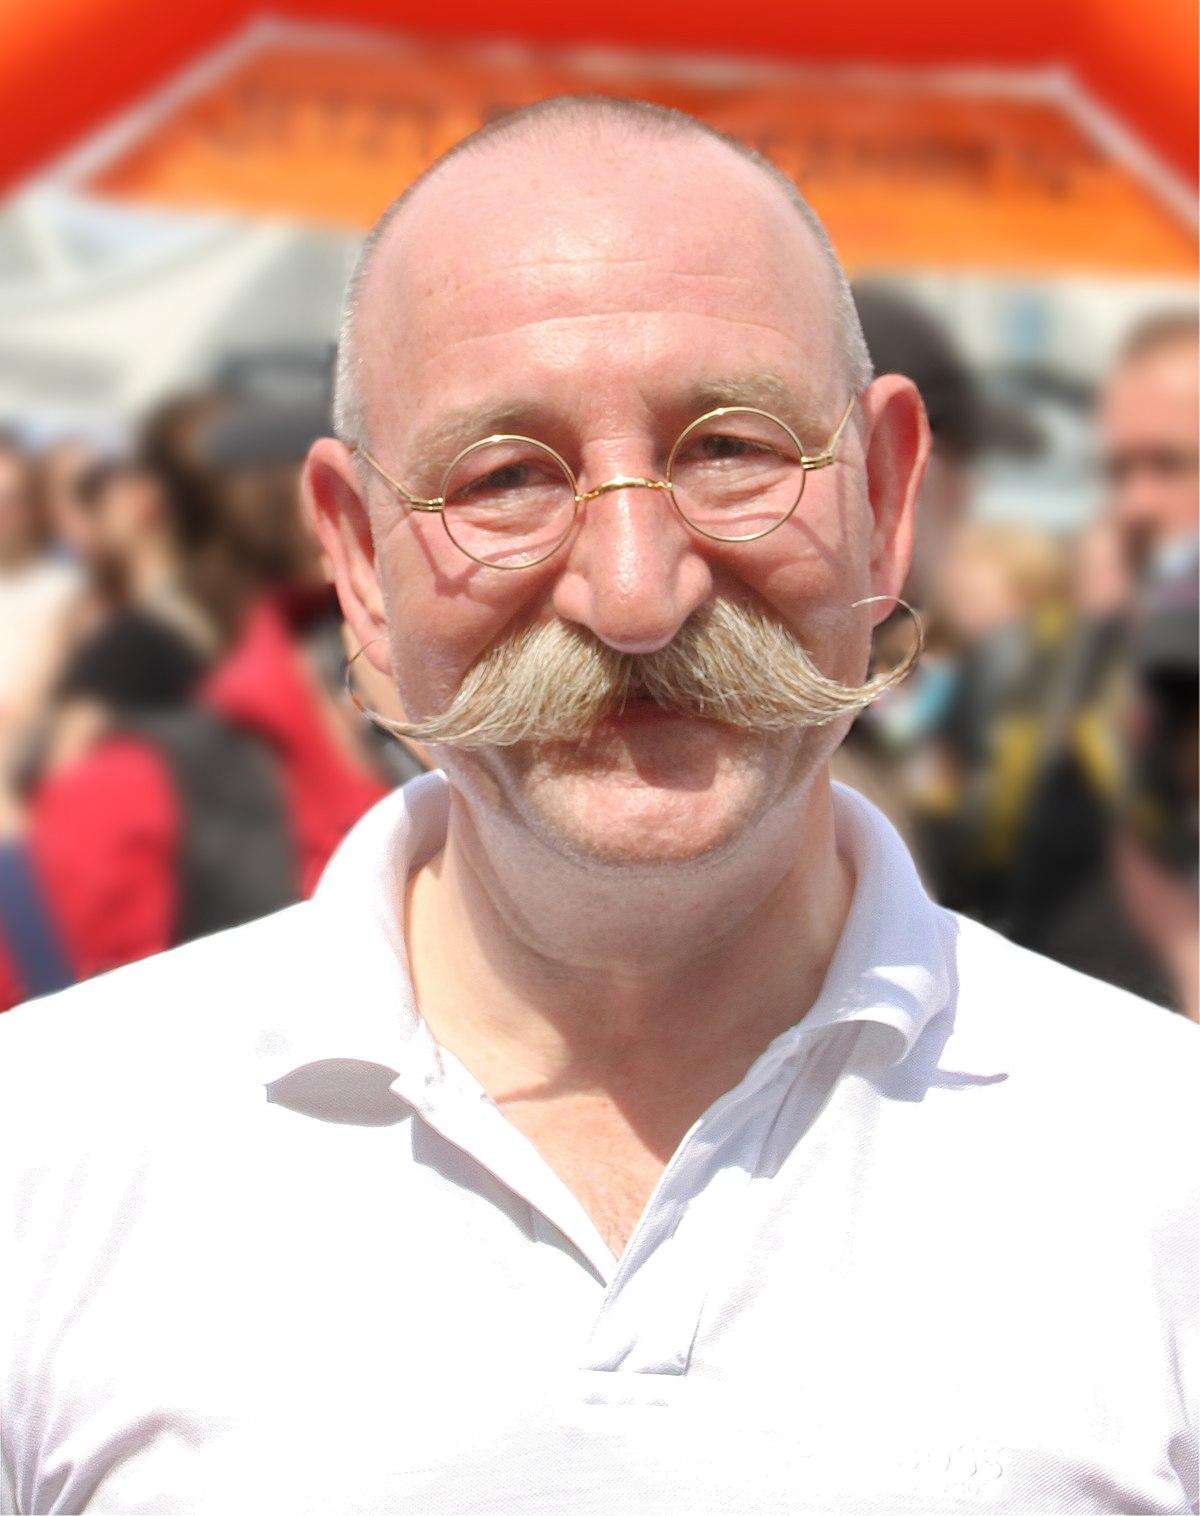 Körpergröße Horst Lichter